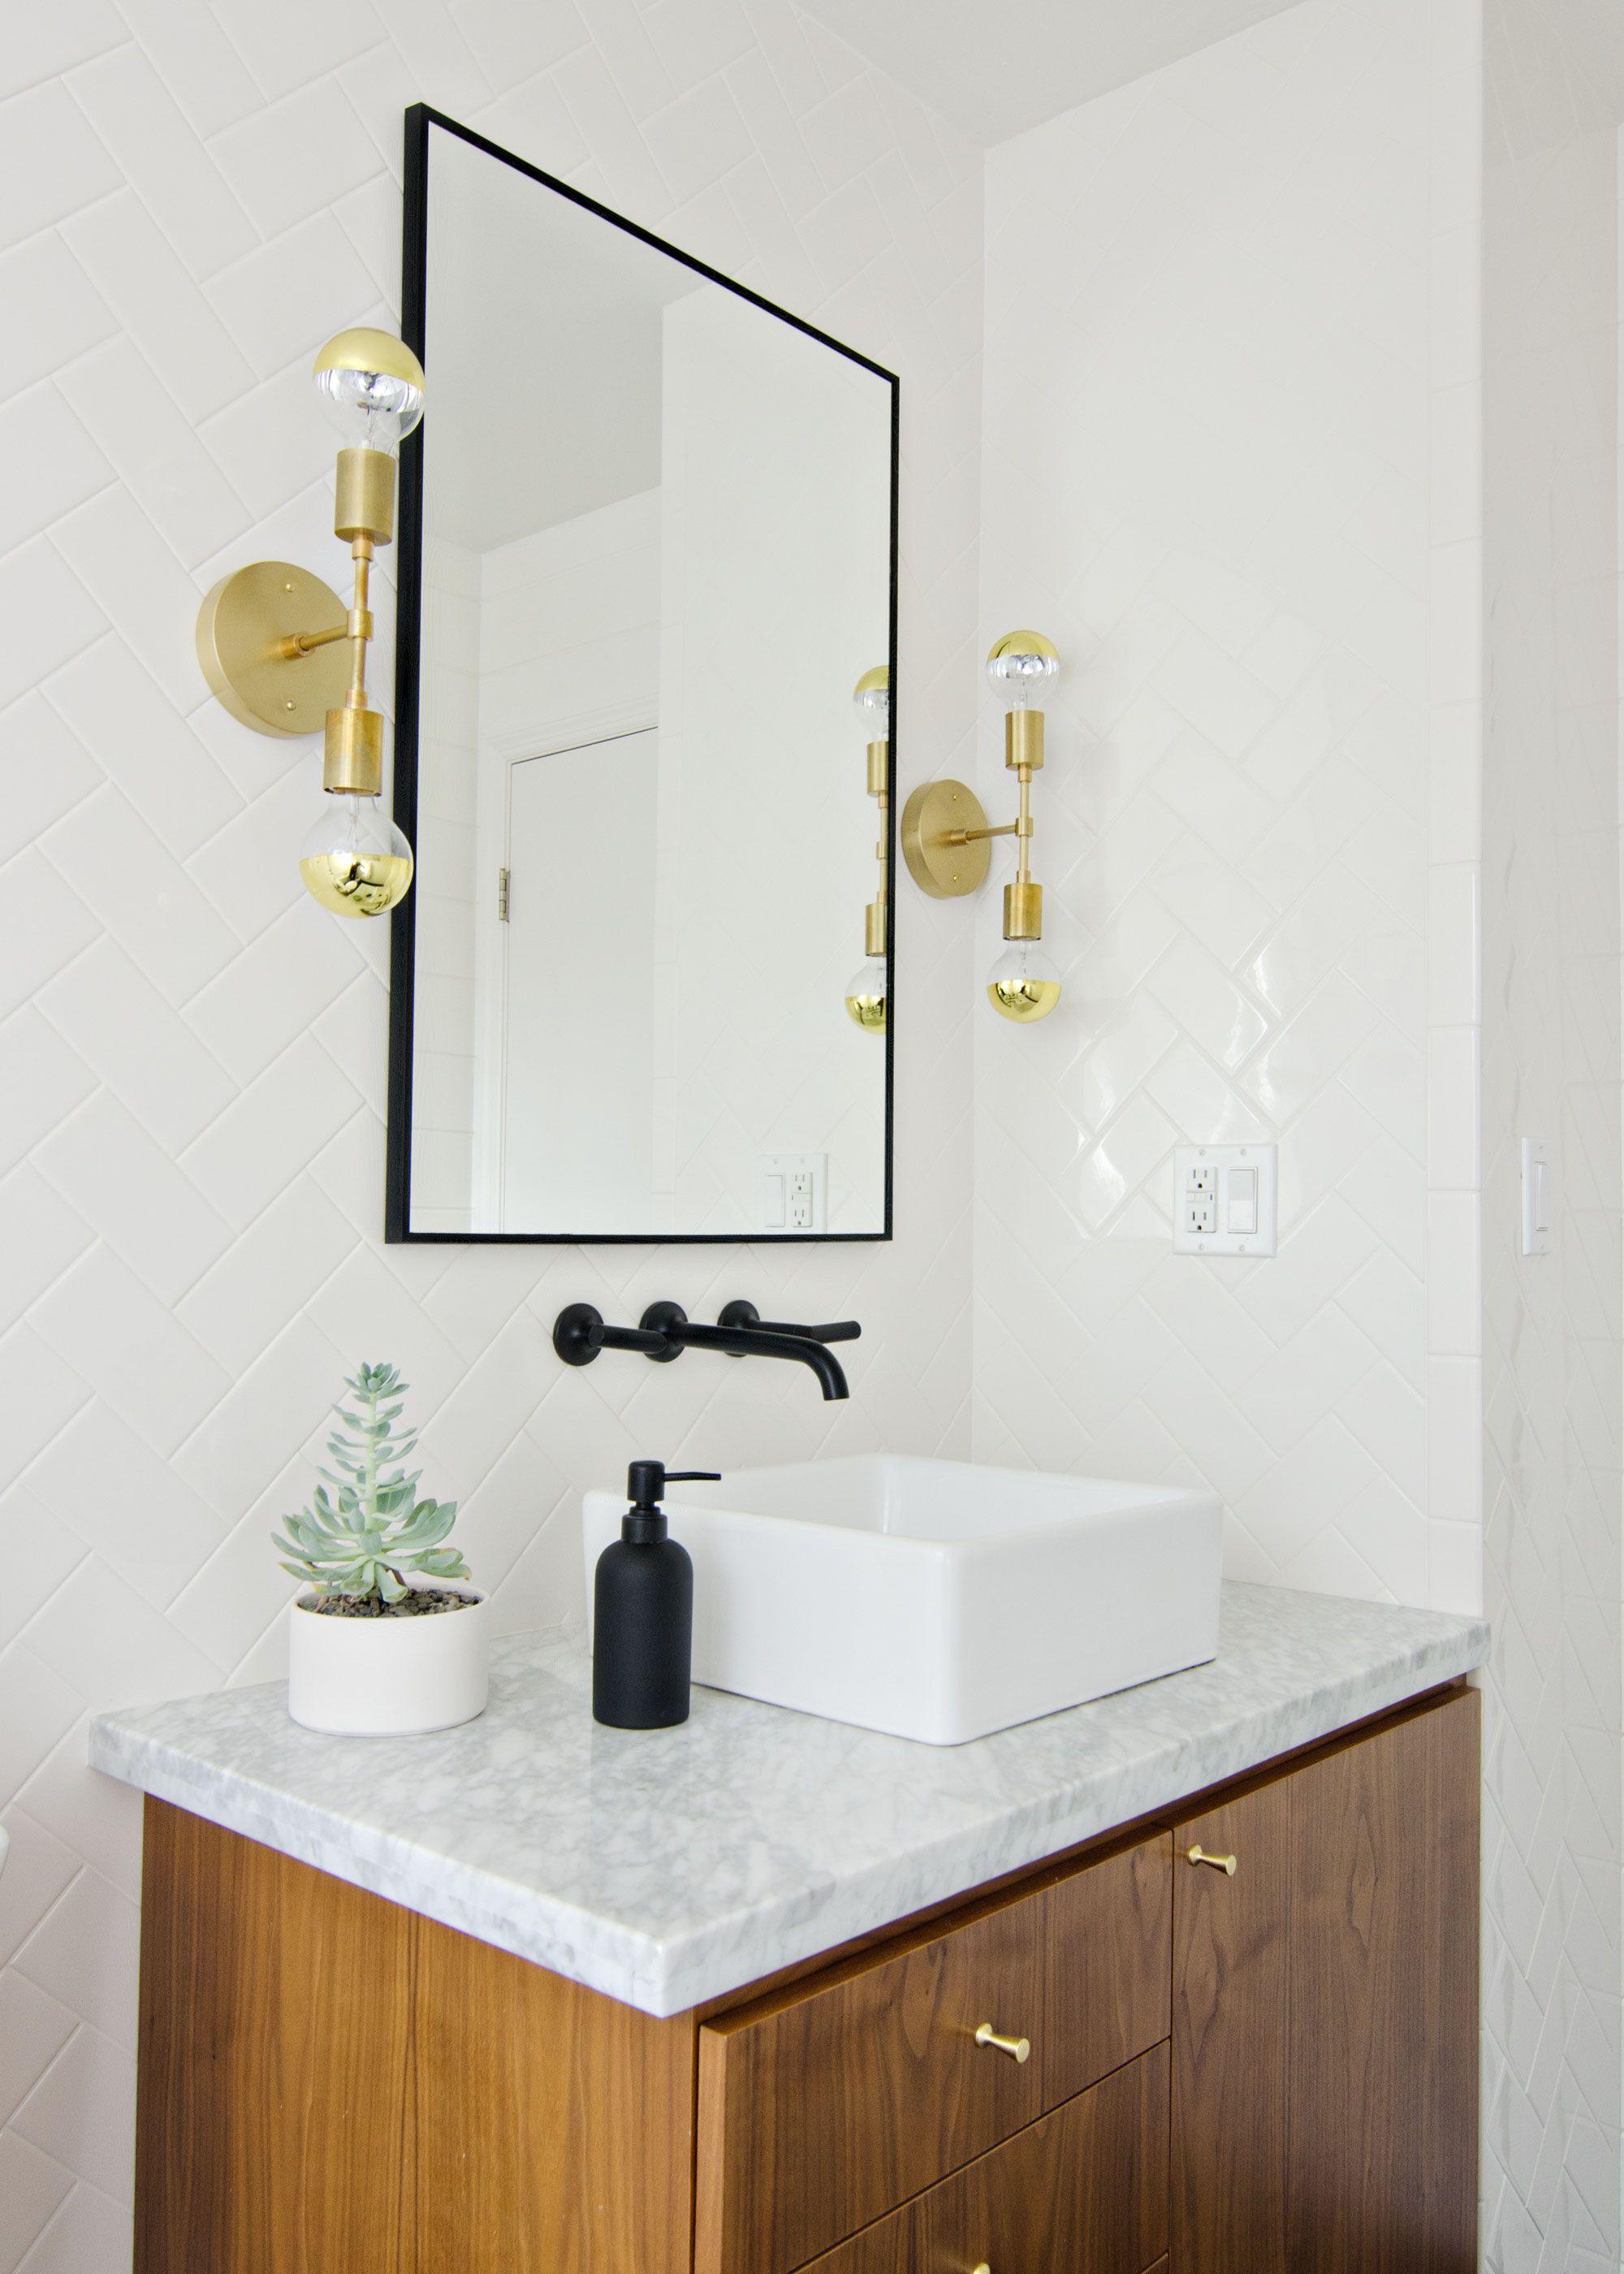 Black, white & walnut bathroom with black faucet & brass ...